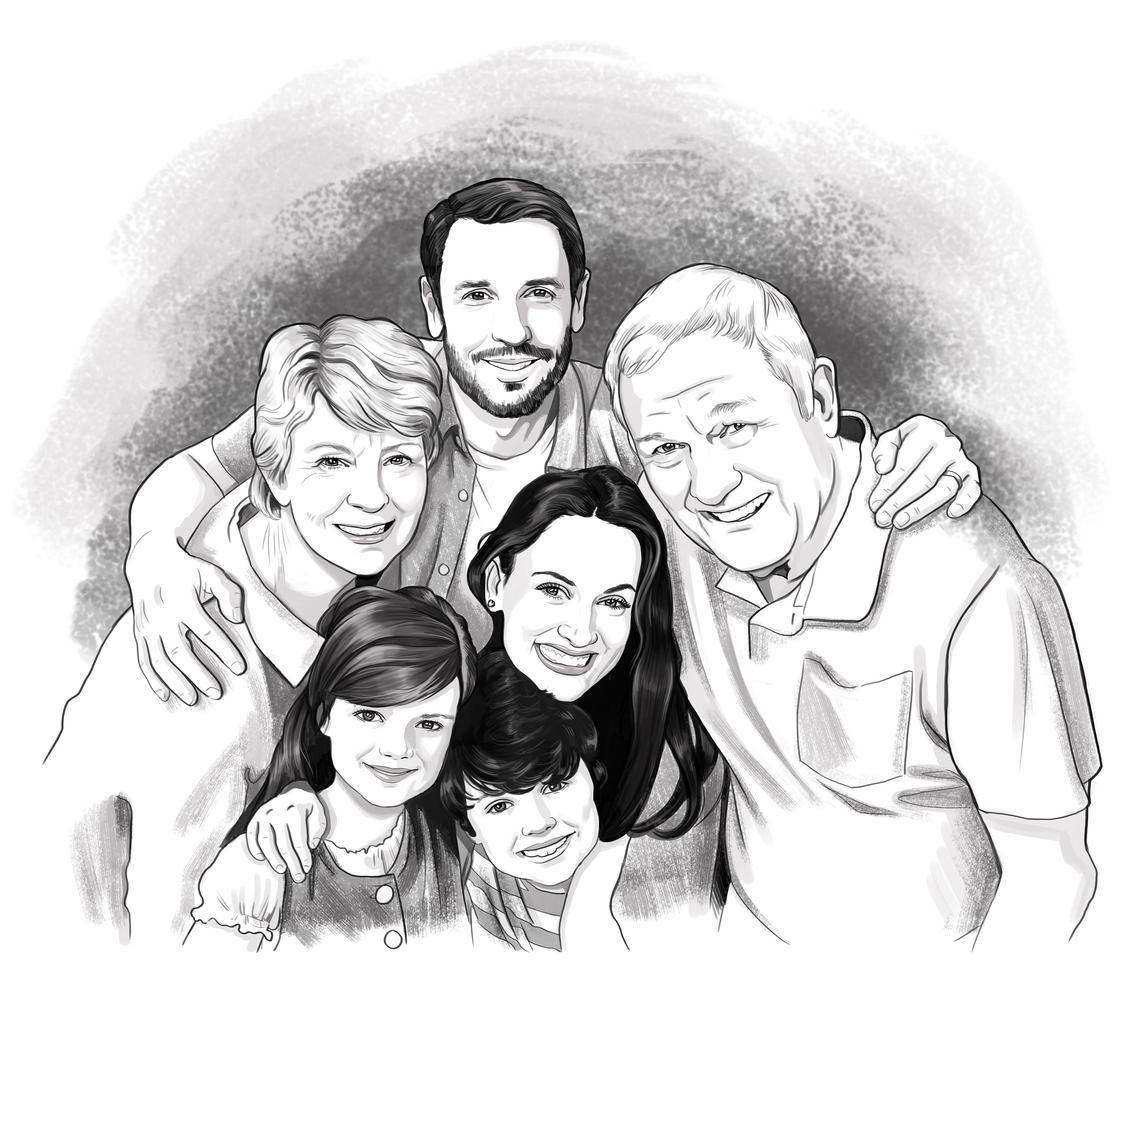 man sketch sketch from photo Custom sketch family skerch pencil sketch